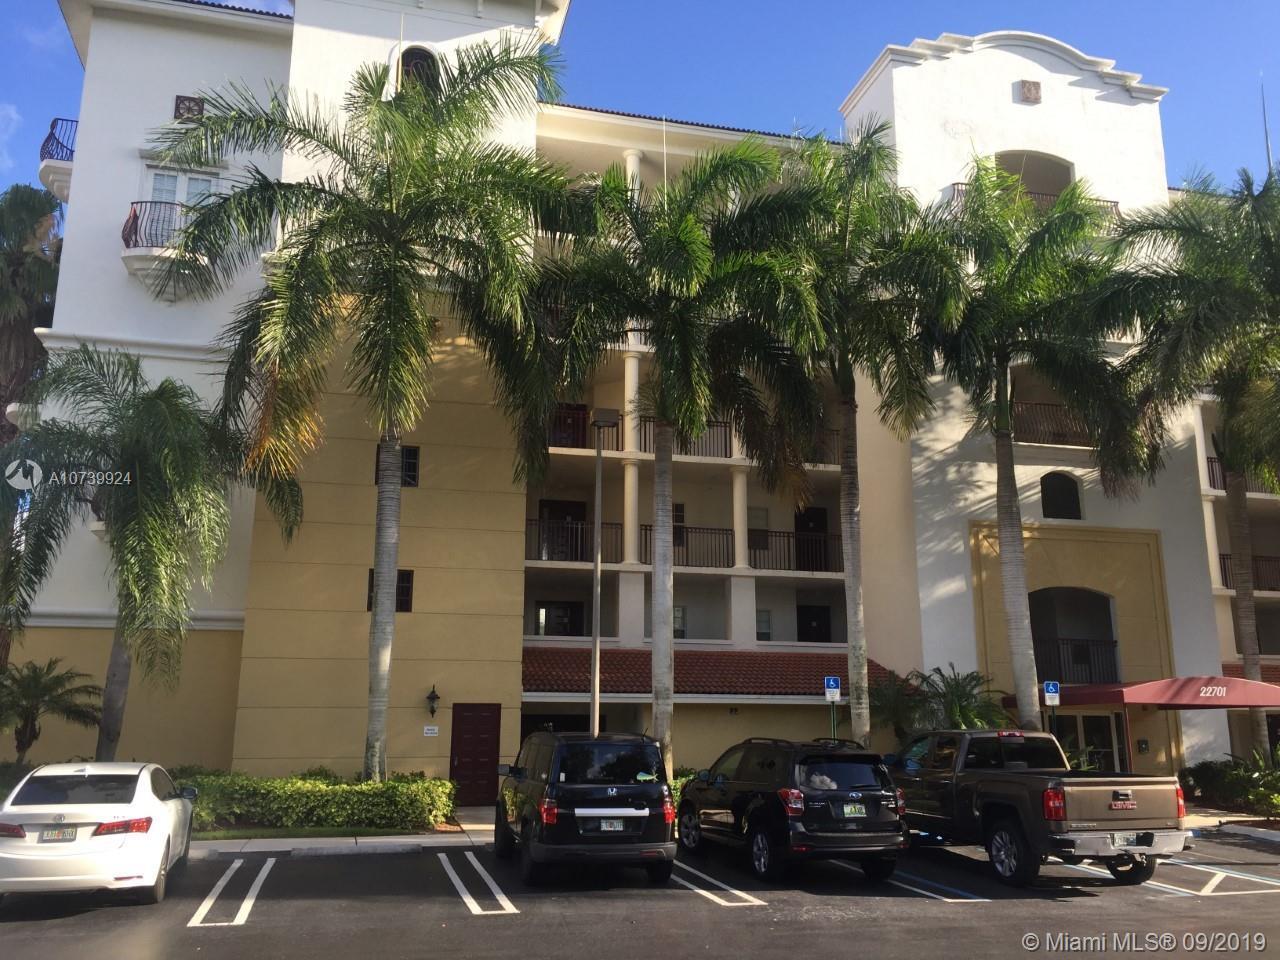 22701 Camino Del Mar 33, Boca Raton, FL 33433